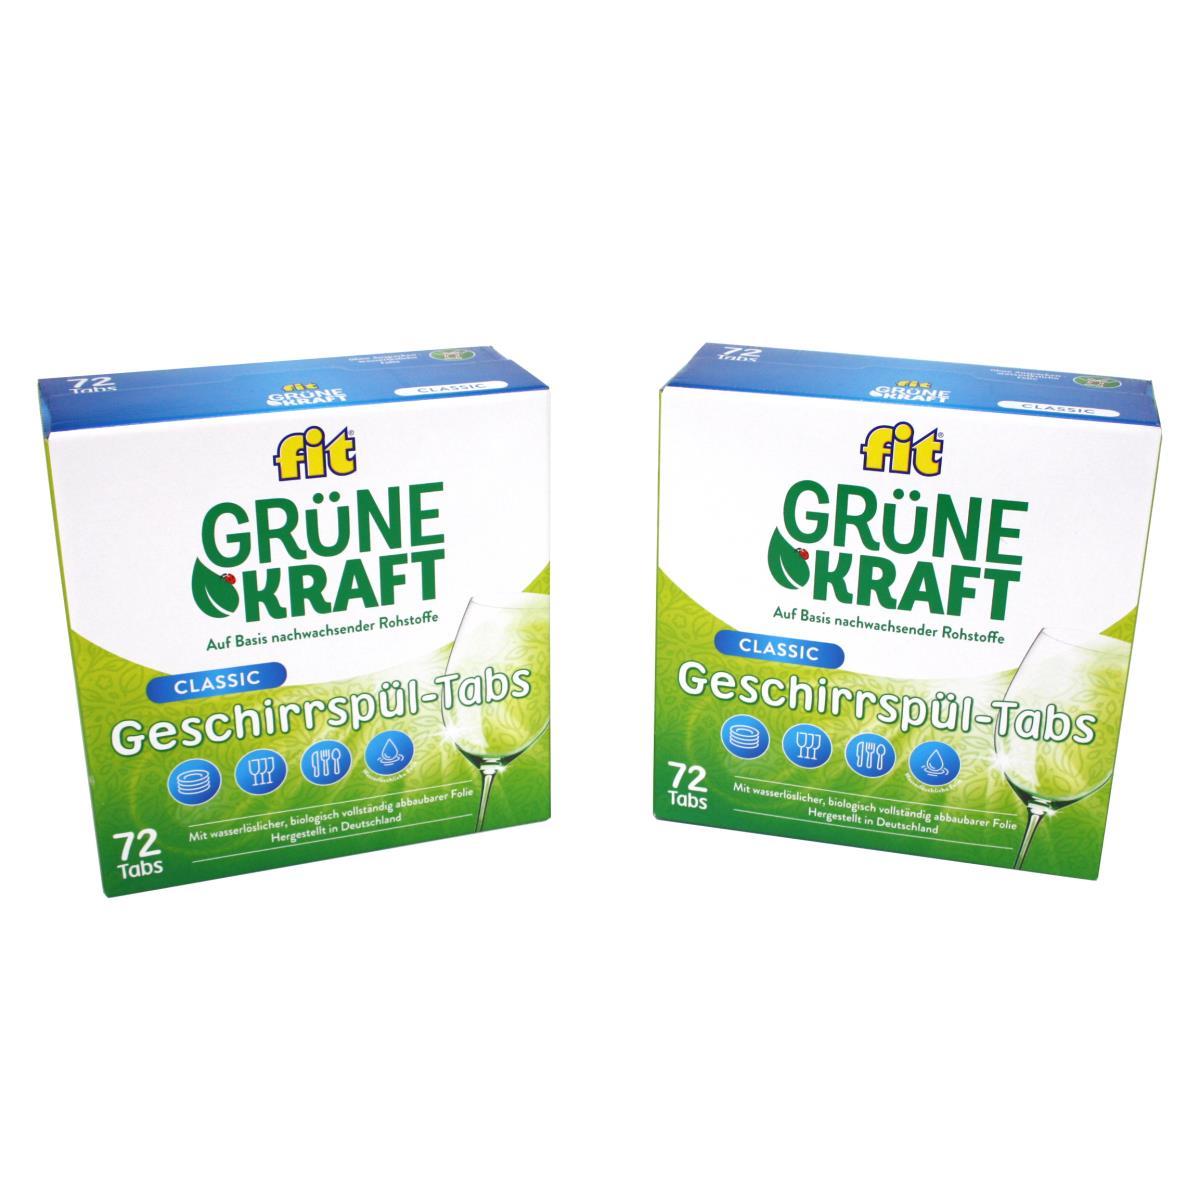 FIT Grüne Kraft Classic 144 Tabs Spülmaschinentabs Geschirrspültabs,Fit,4013162016280, 0721947483489